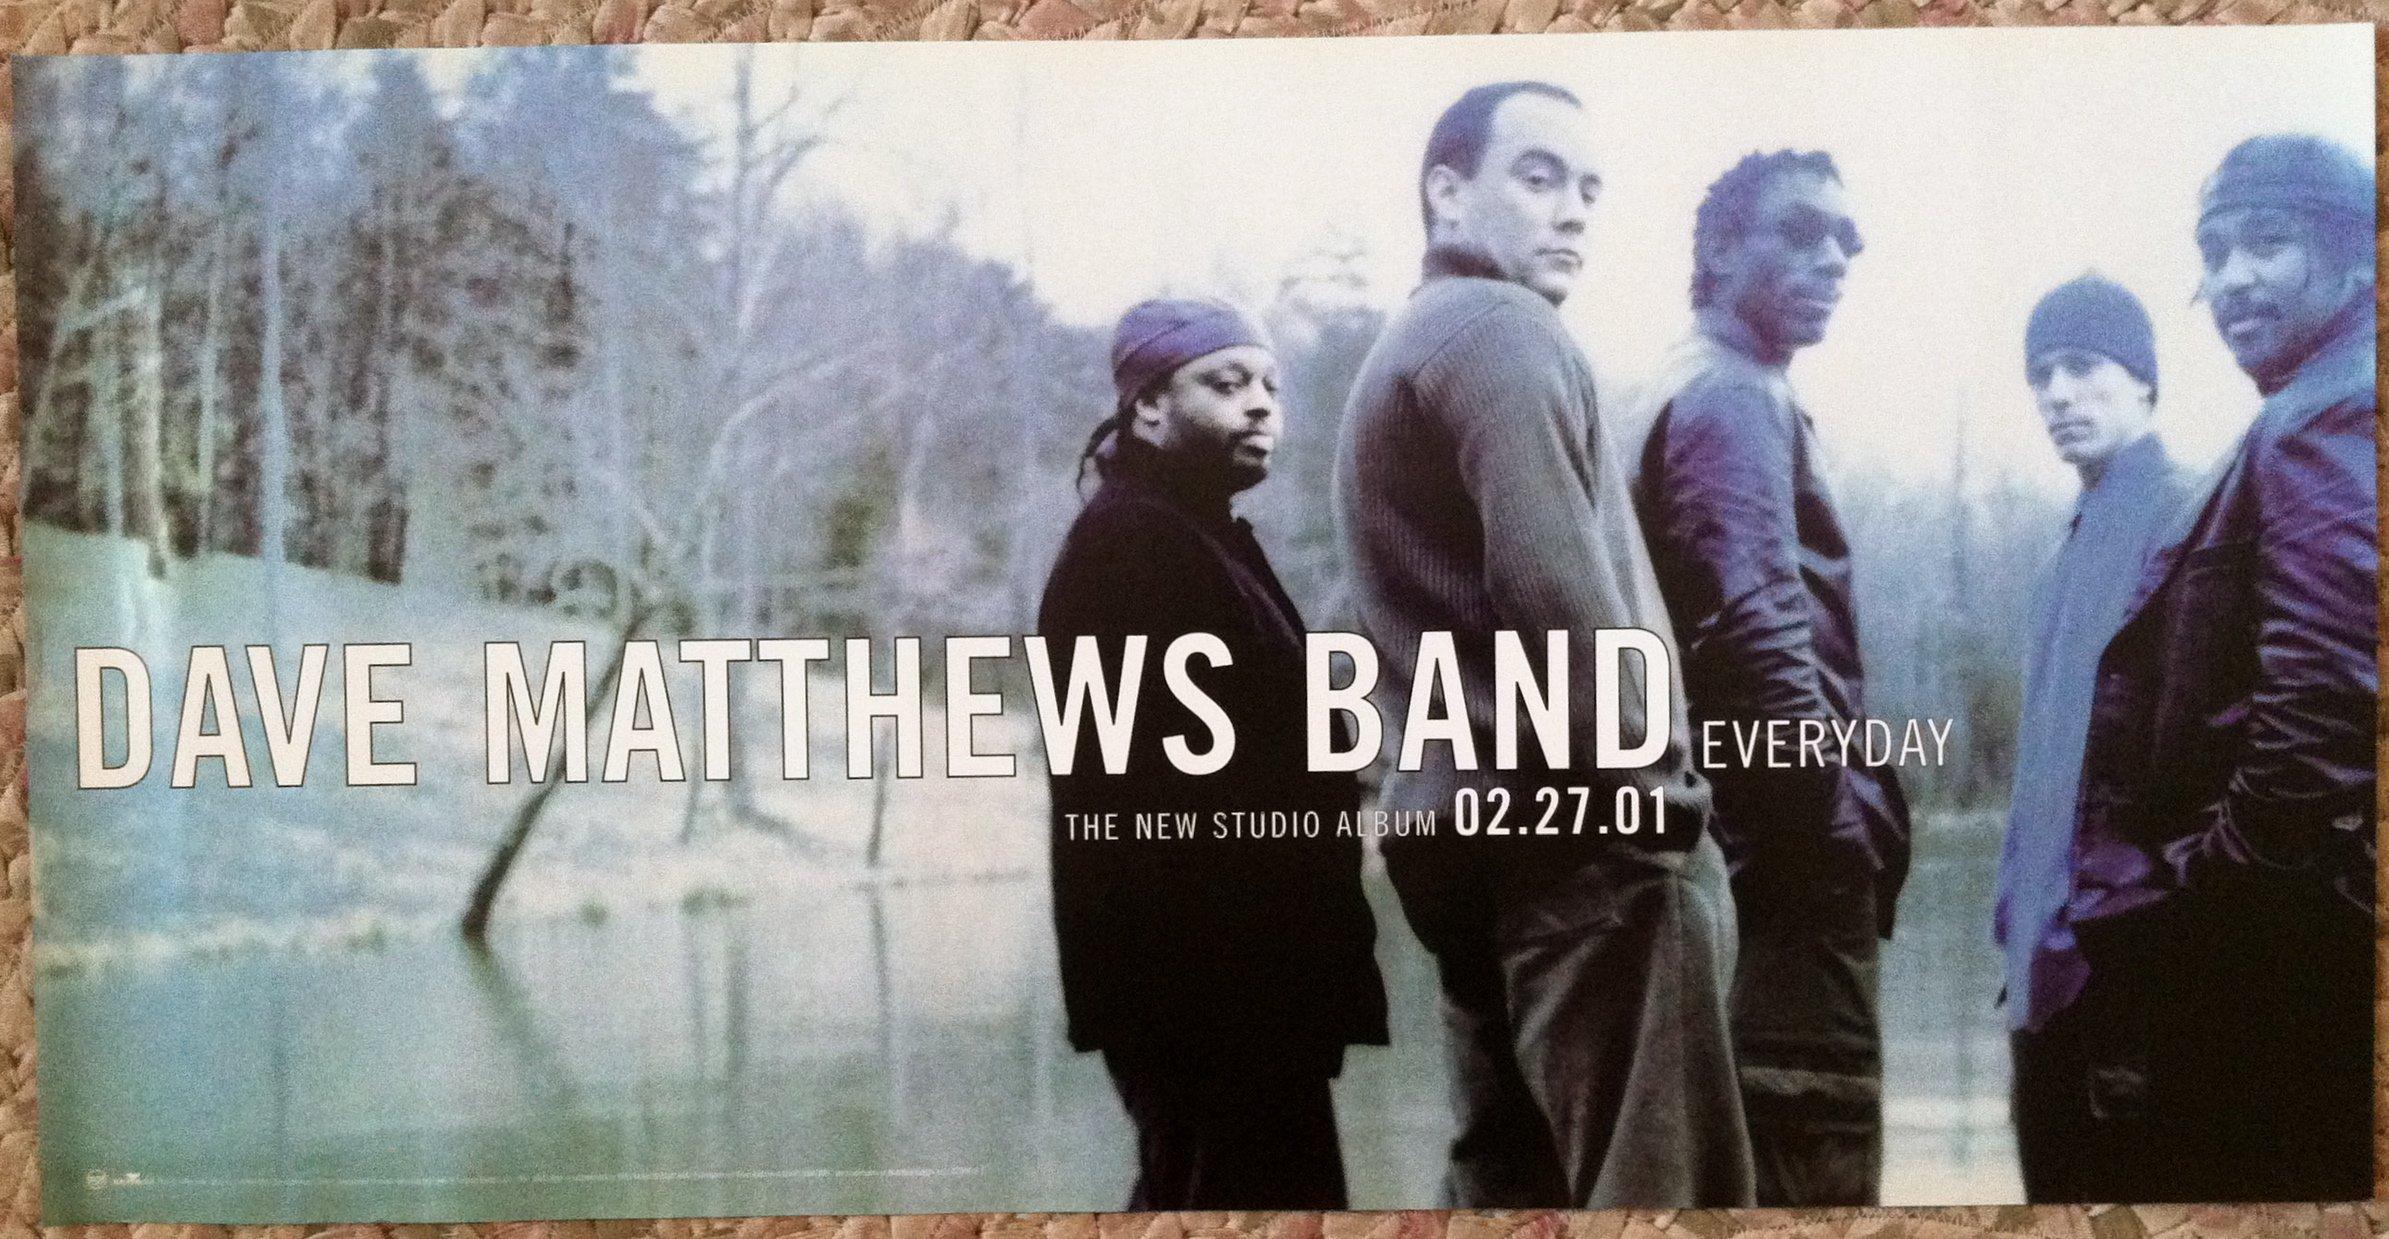 Dave Matthews - Everyday - Rare Advertising Poster 12x24